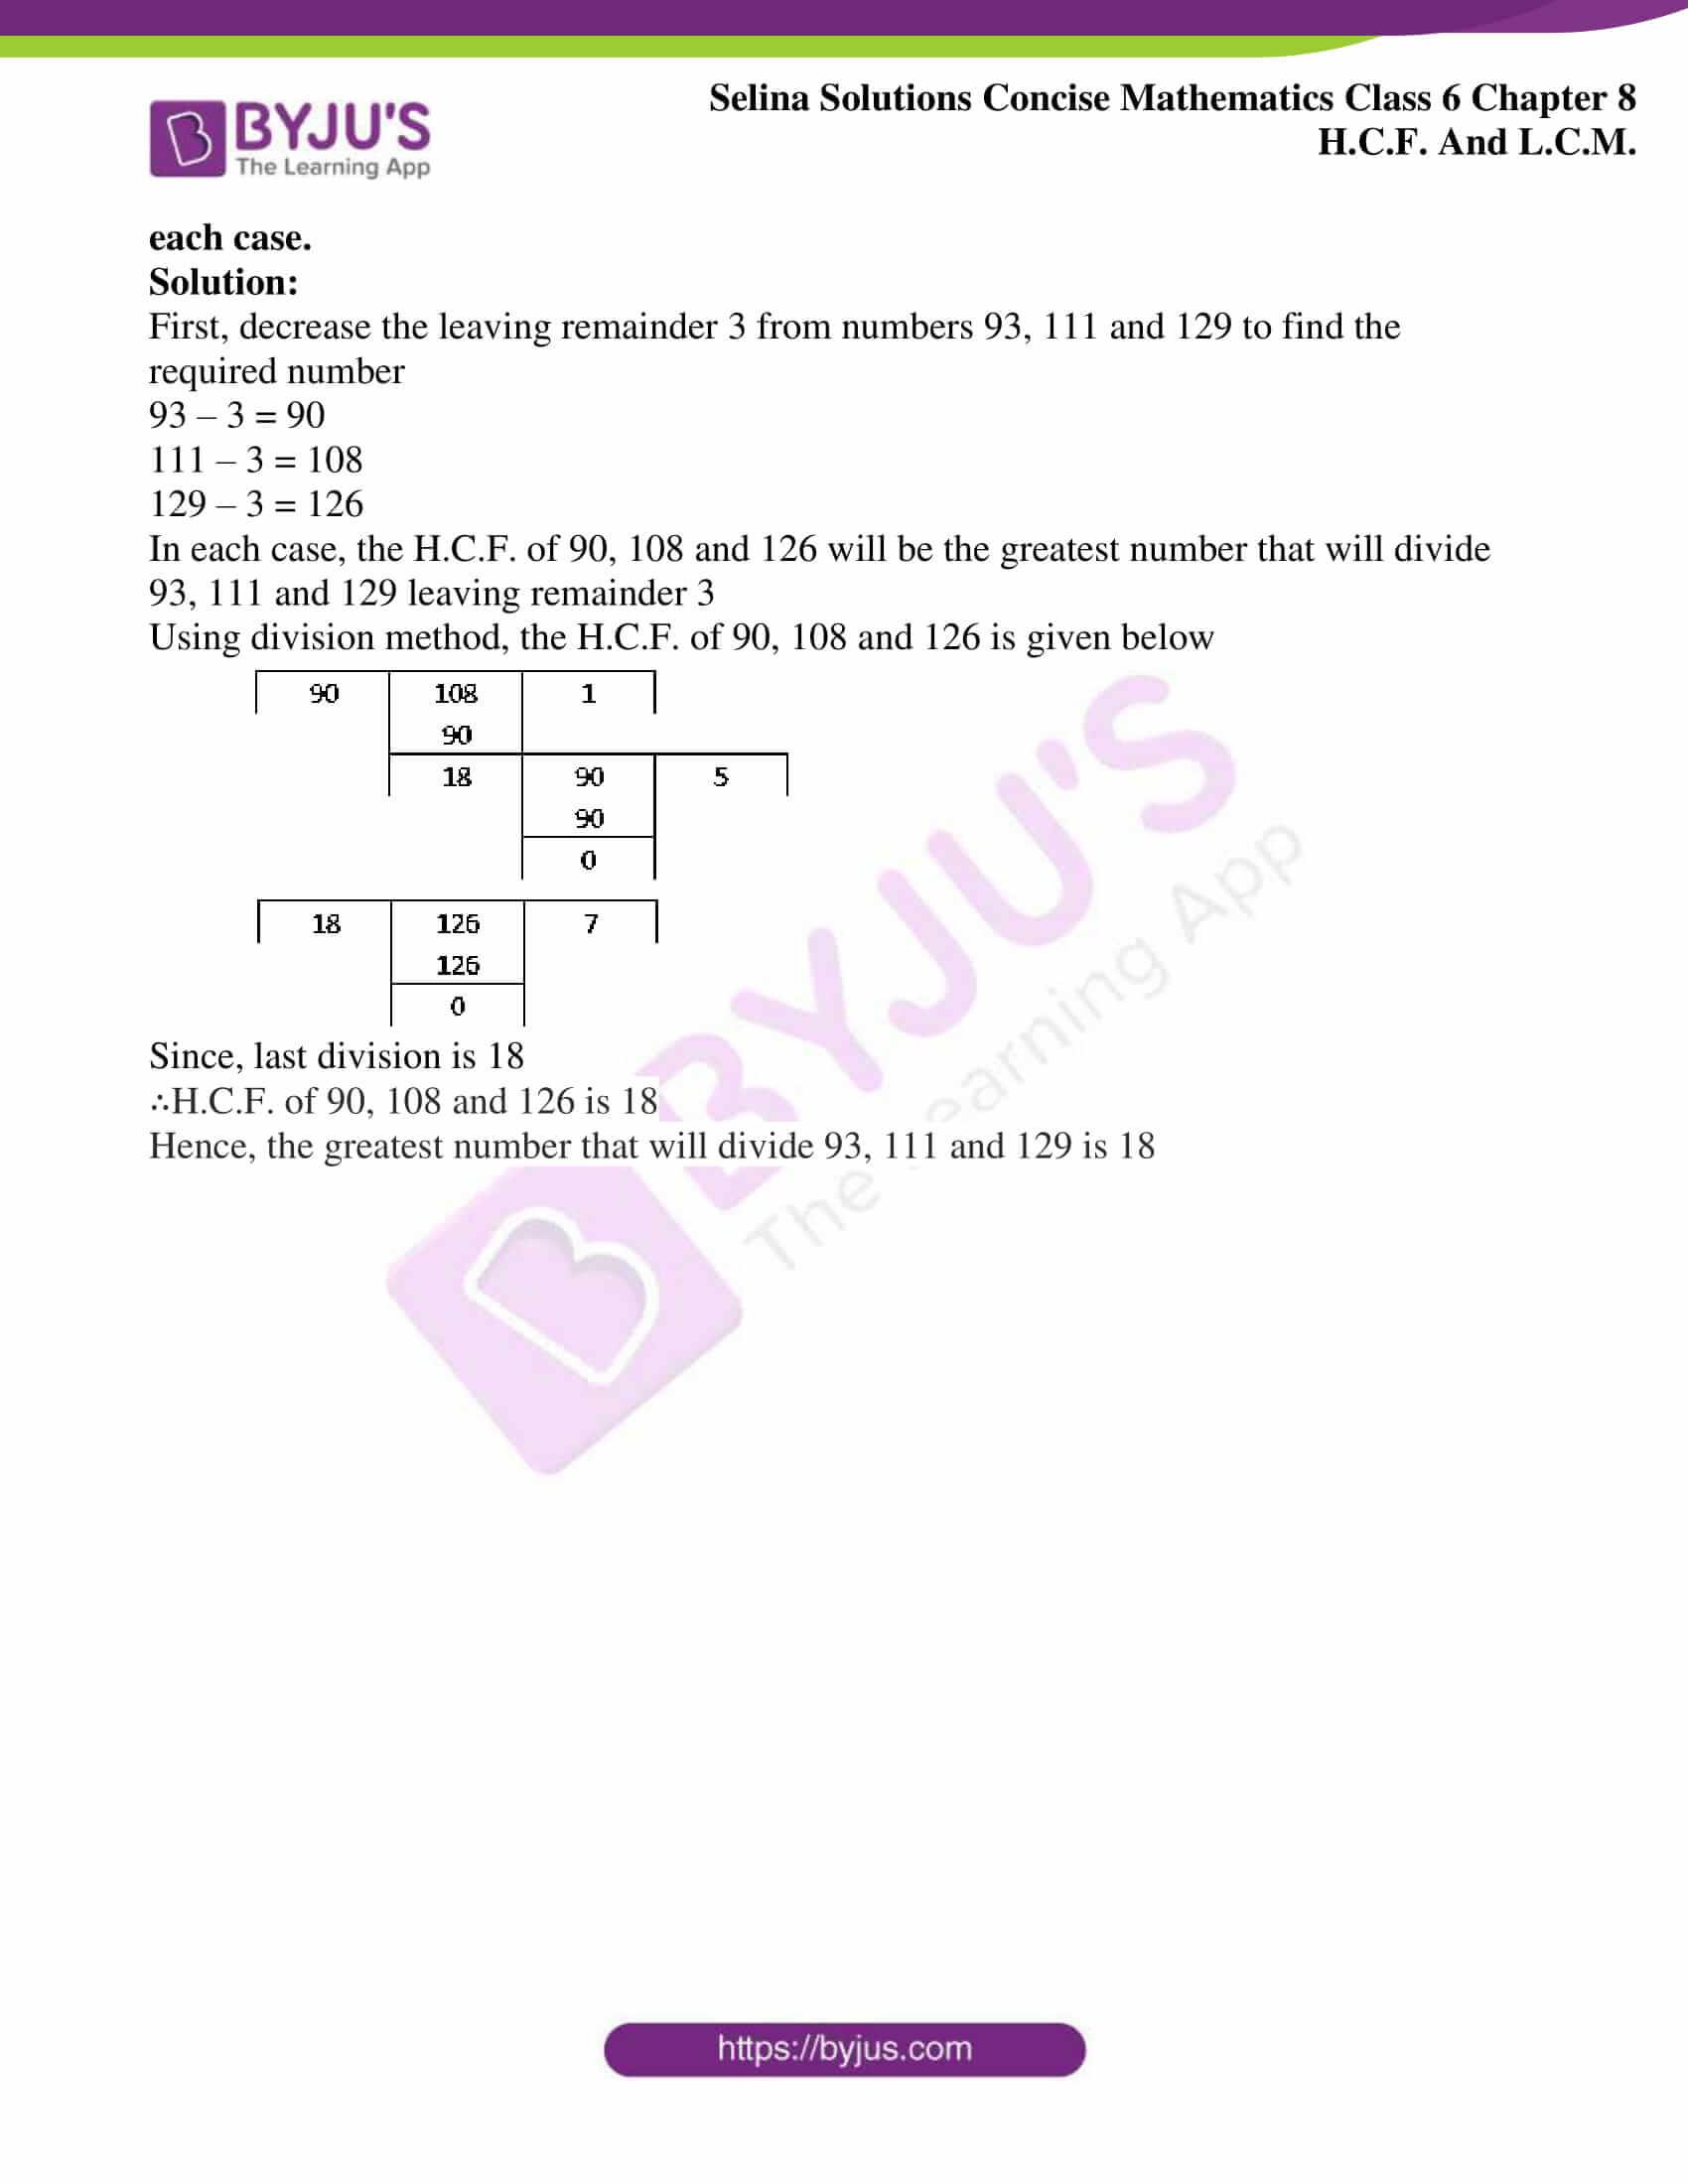 selina sol concise mathematics class 6 ch 8 ex b 9